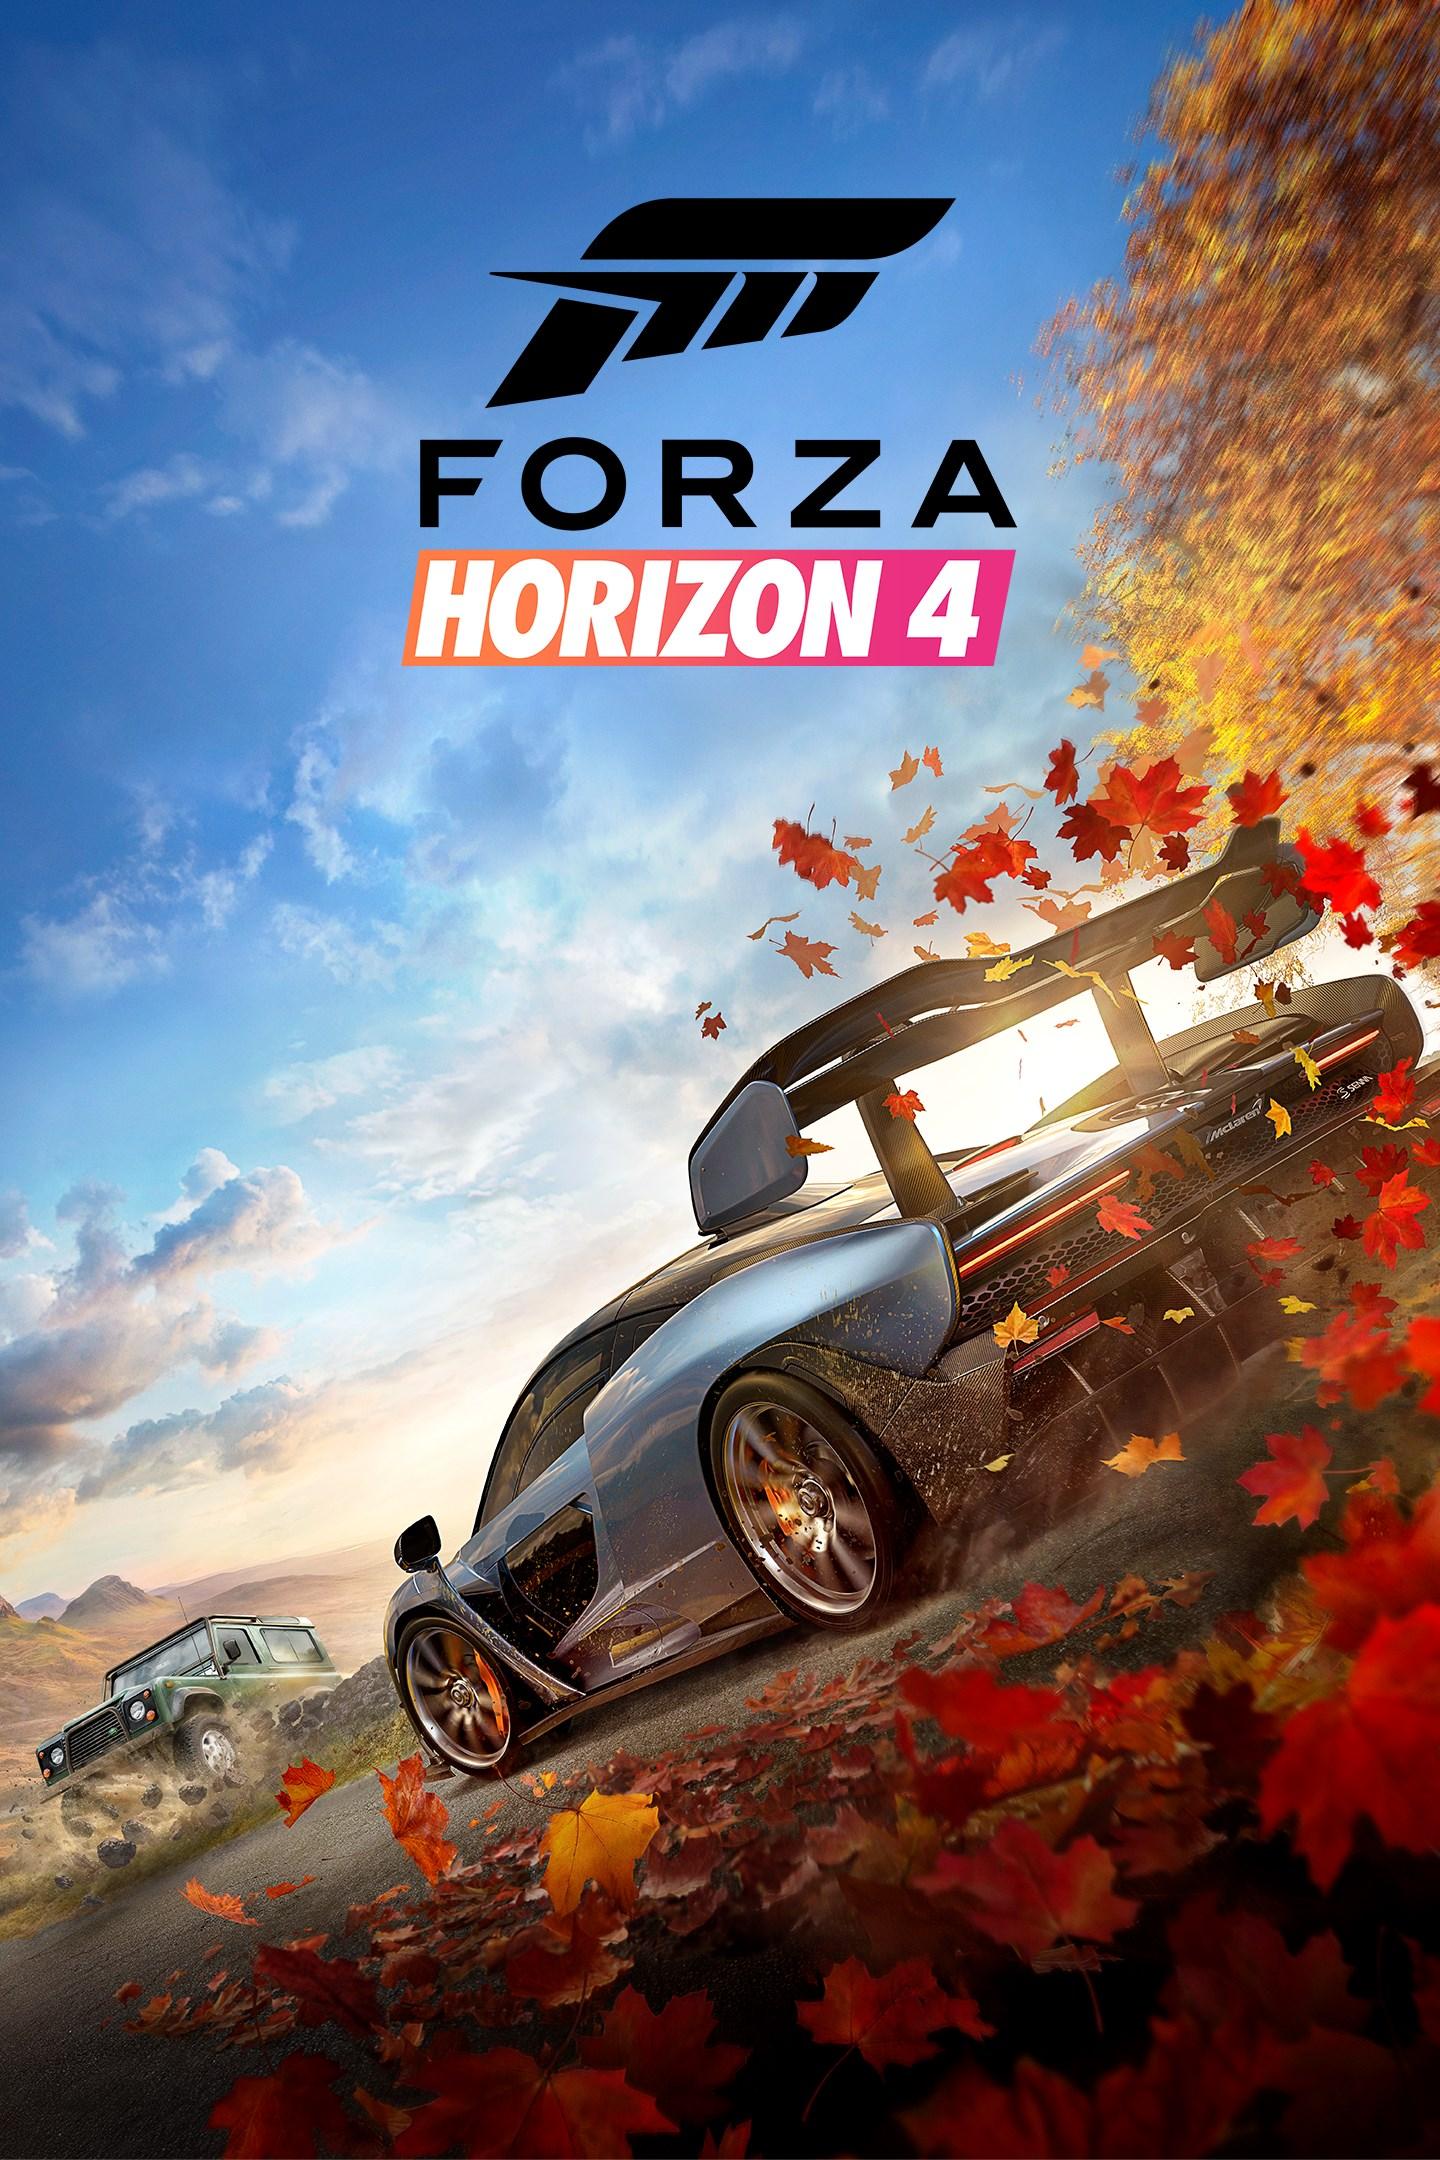 Forza Horizon 4 標準版/セール価格:3,726円(税込、50%オフ)